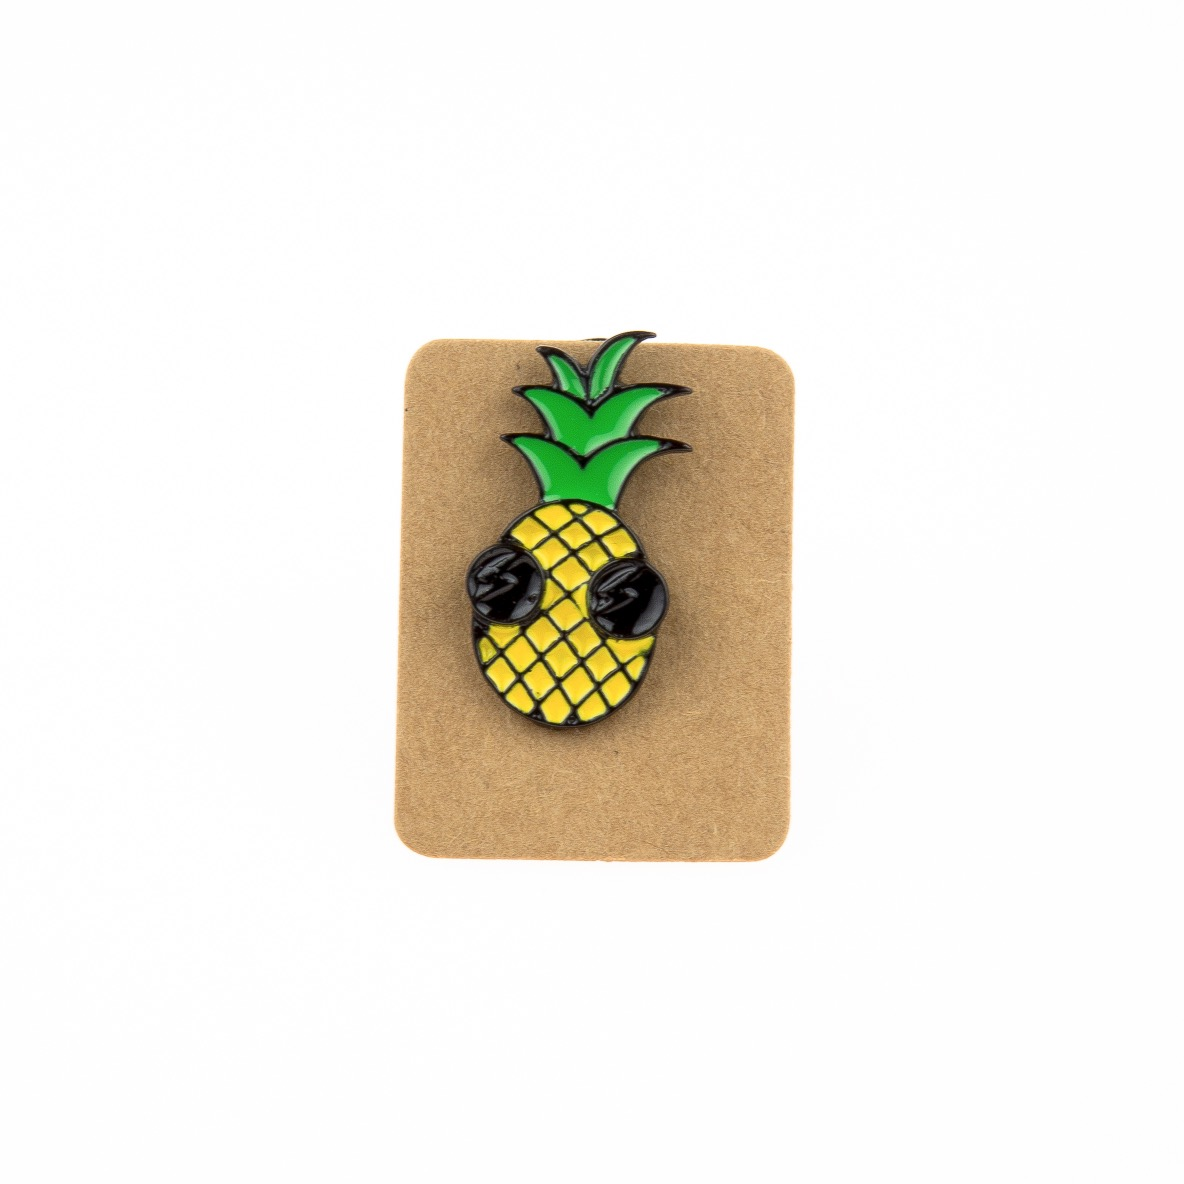 Metal Pineapple Sunglass Enamel Pin Badge